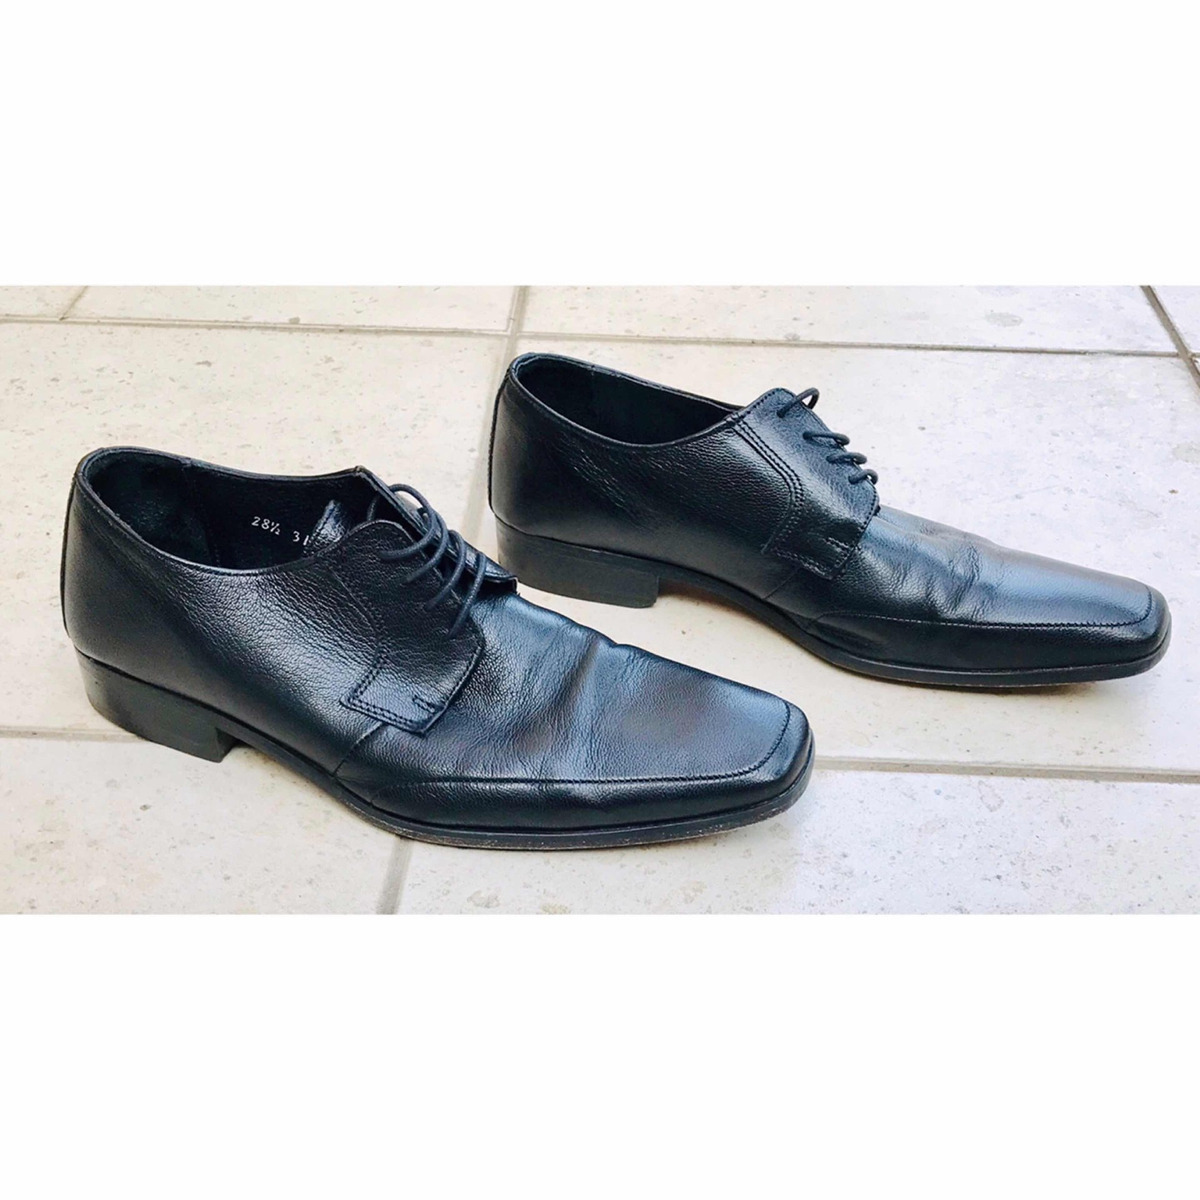 Zapatos Formales Usados749 Piel De Con 00 Negros 5 Tacón 28 Hombre 8vn0mwN